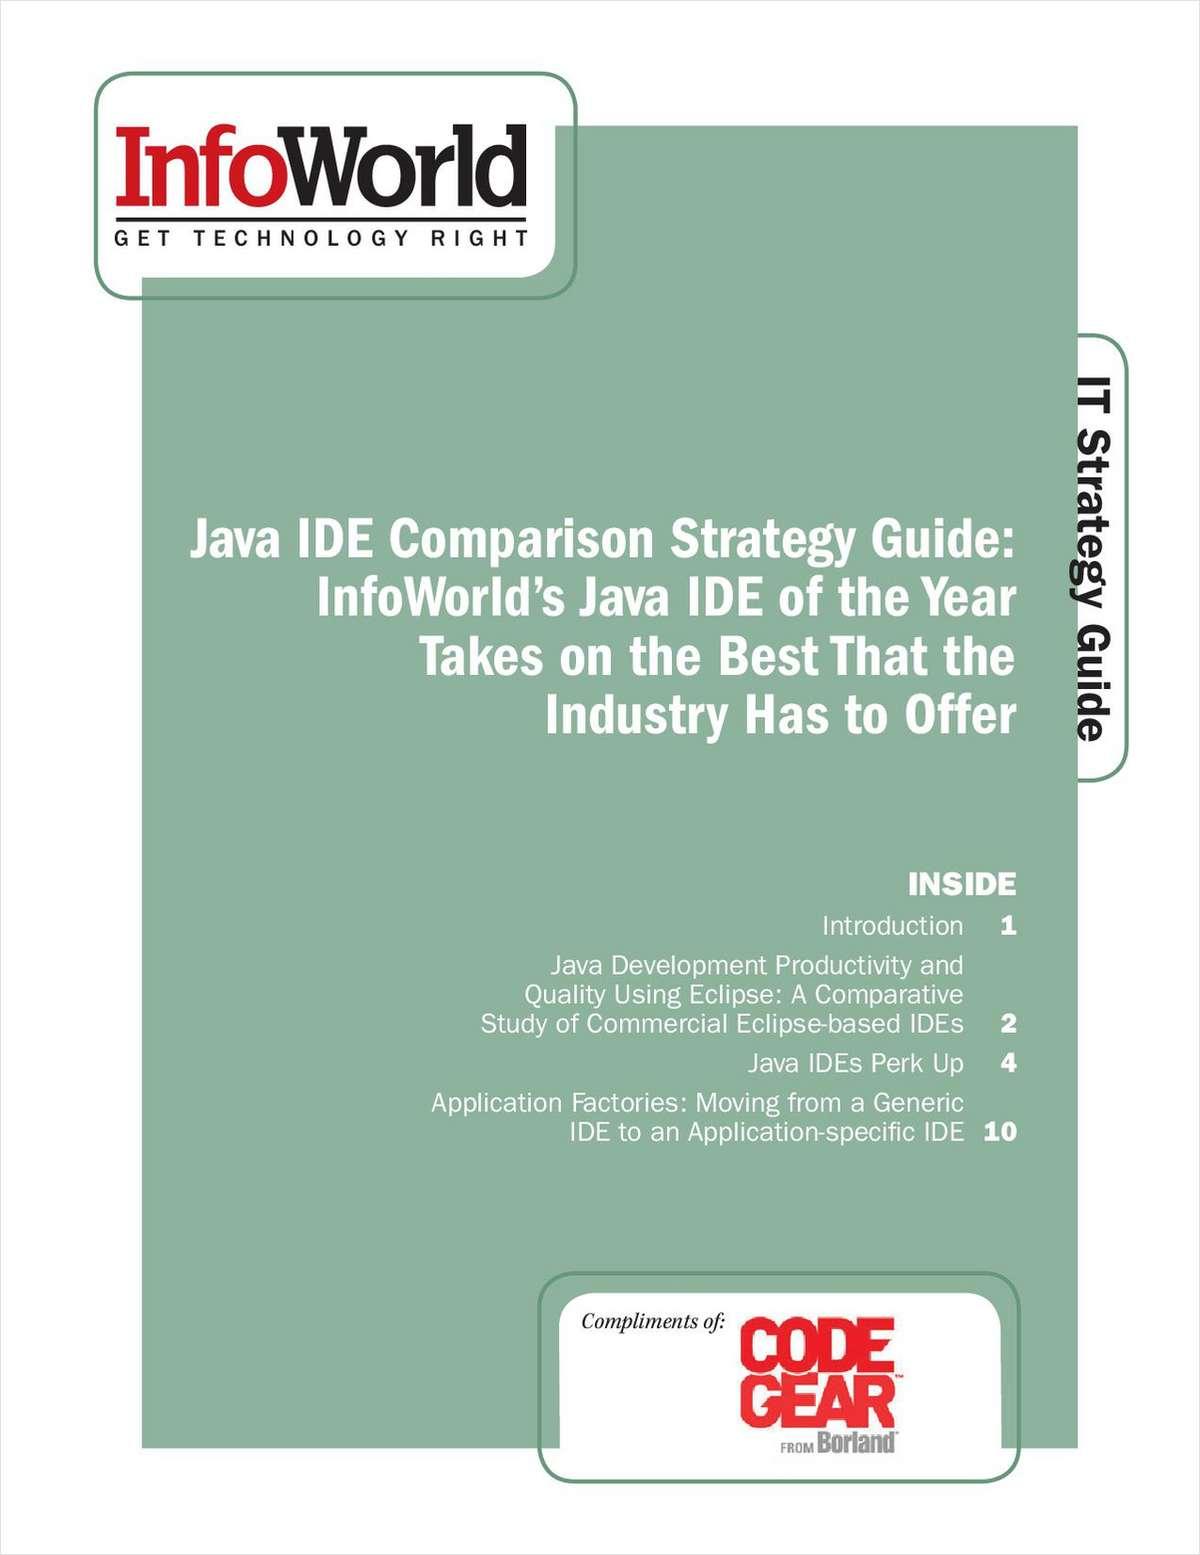 InfoWorld's Java IDE Comparison Strategy Guide